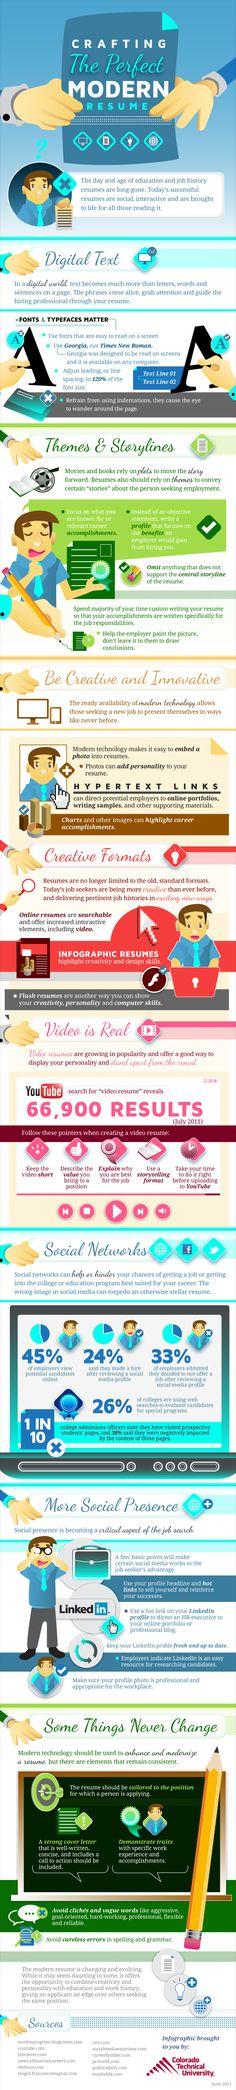 modern resume tips infographic